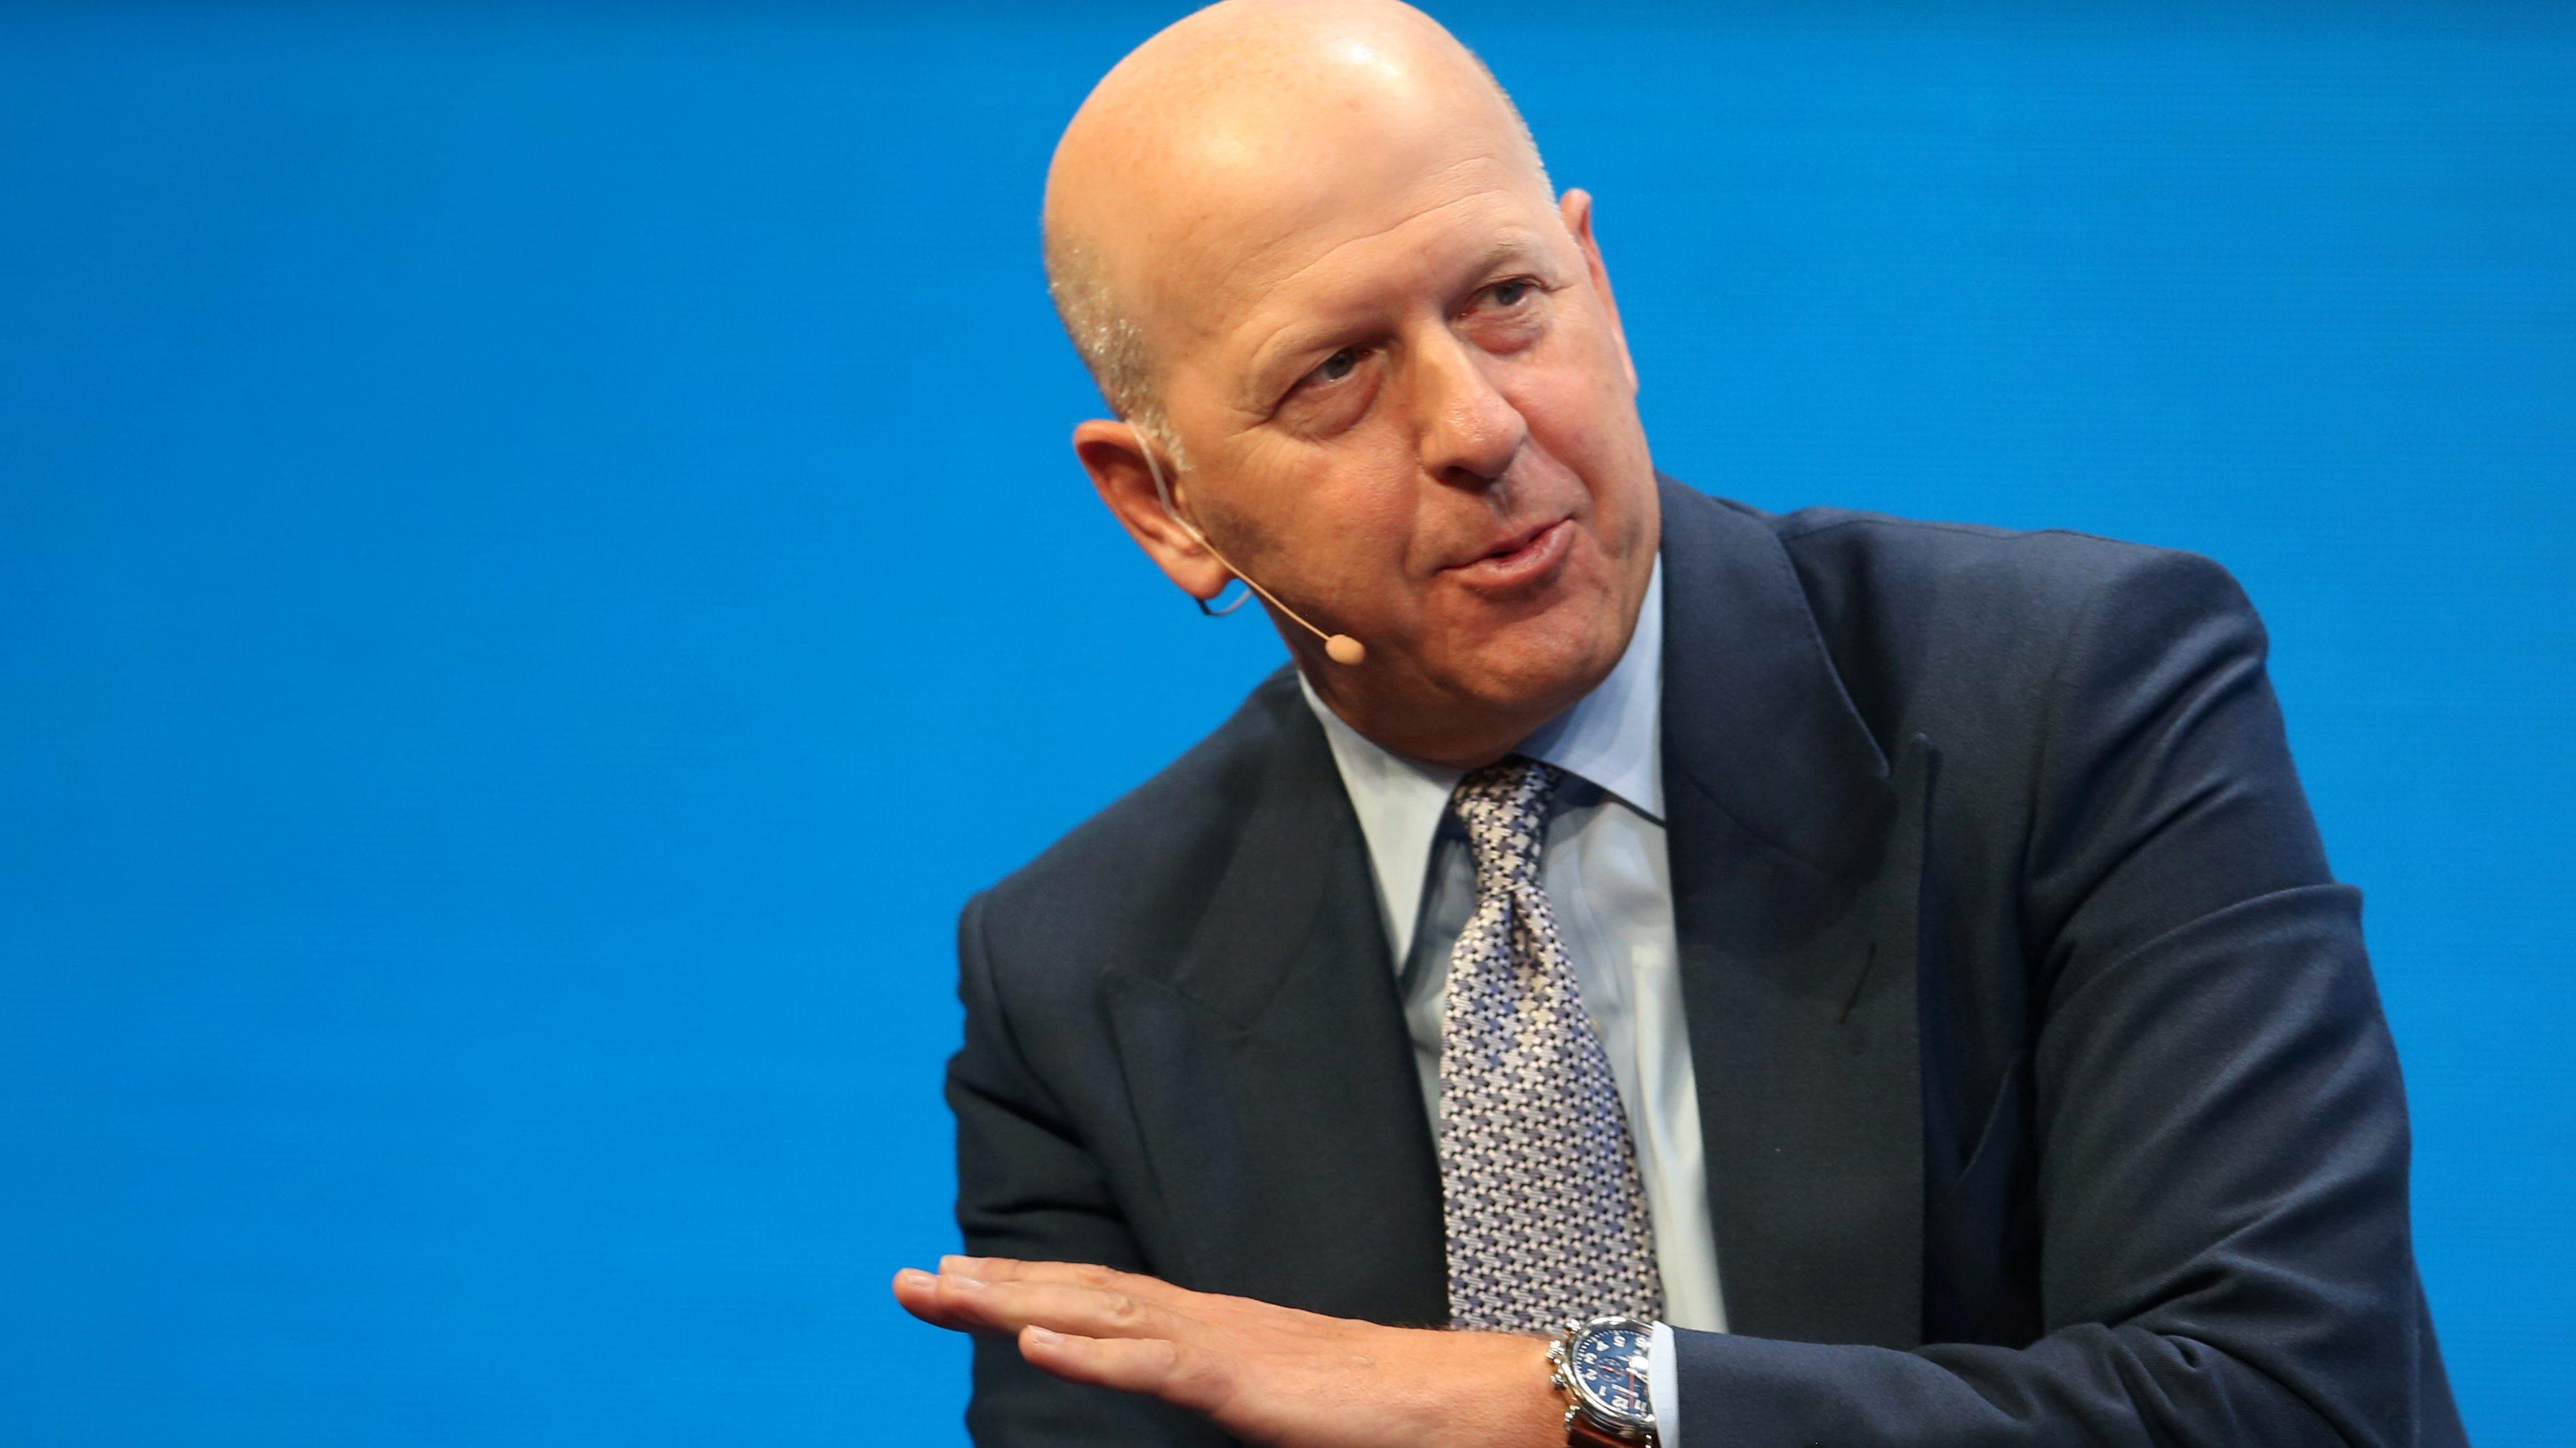 David Solomon of Goldman Sachs